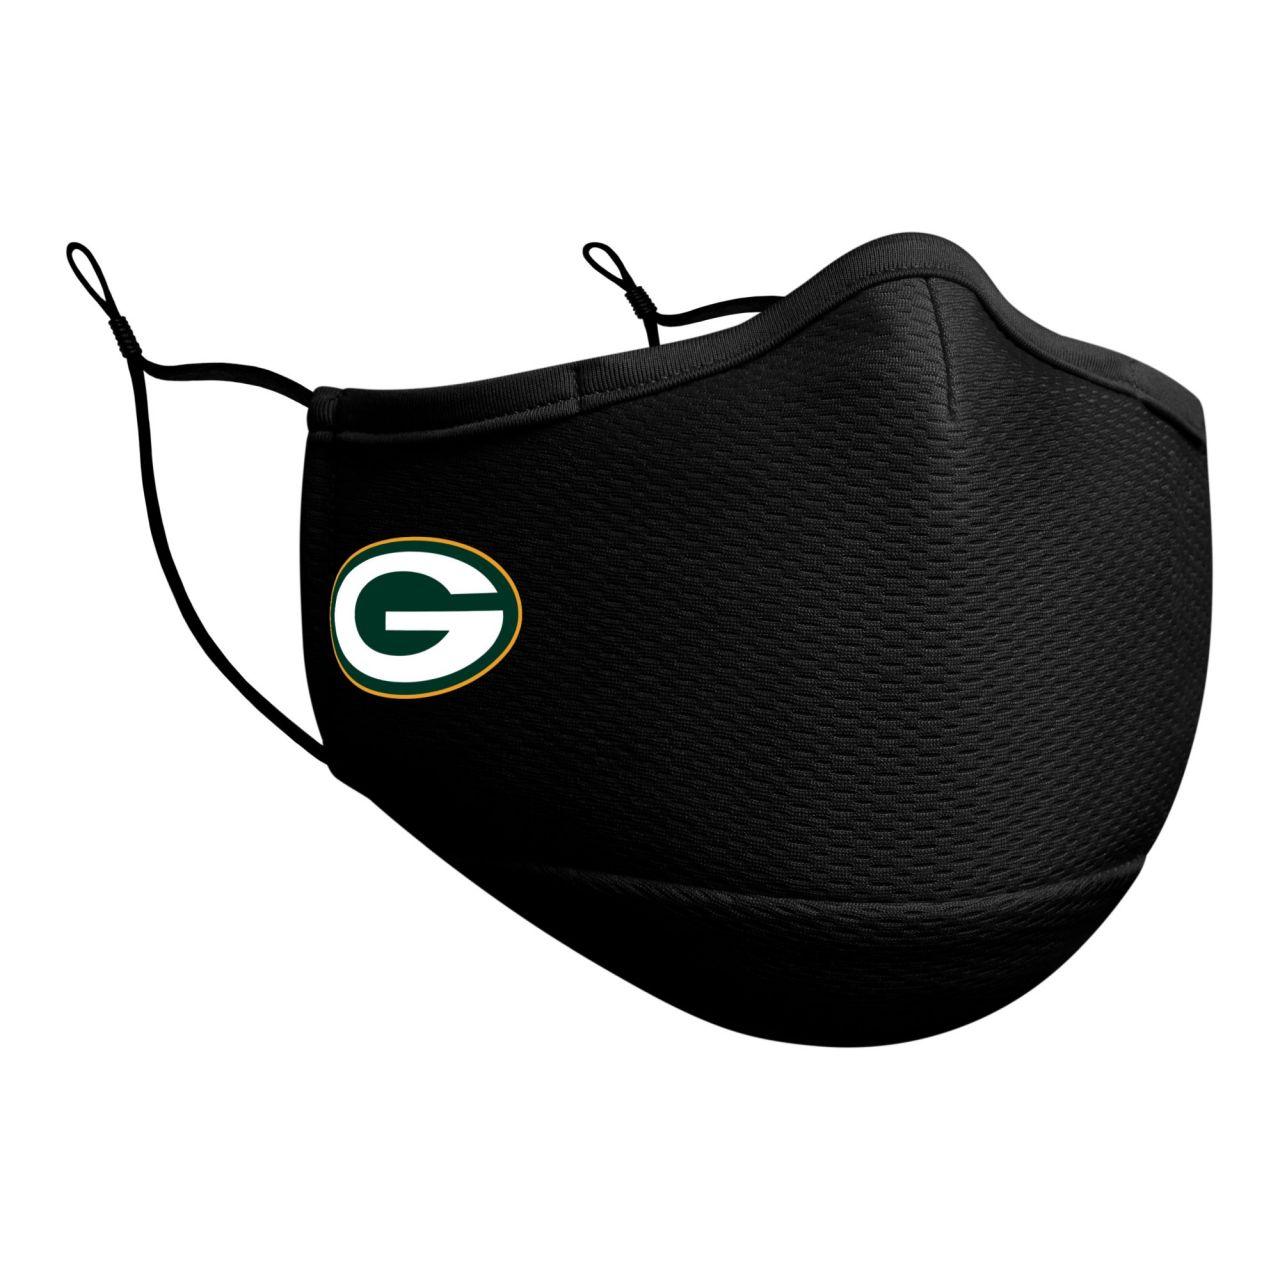 New Era NFL Face Mask Gesichtsmaske - Green Bay Packers